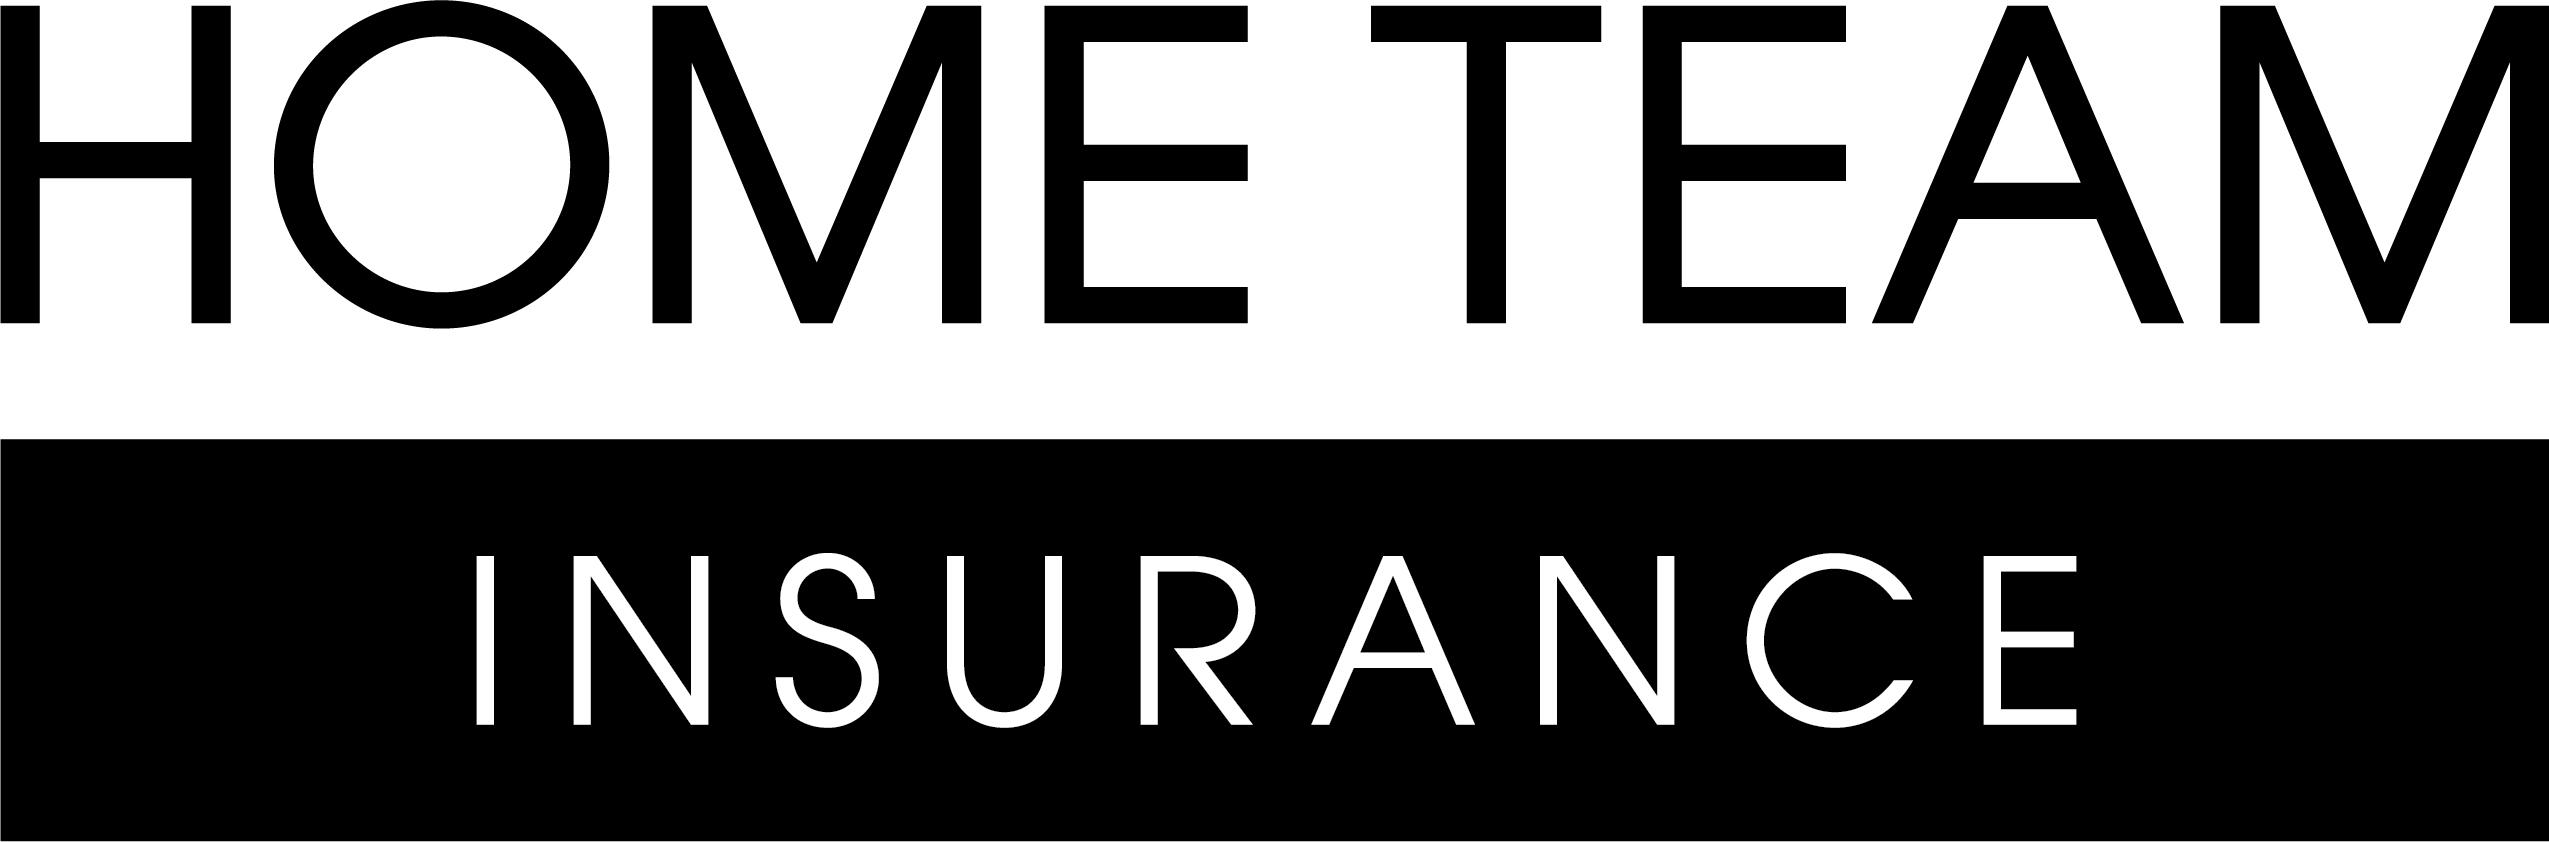 Home Team Insurance